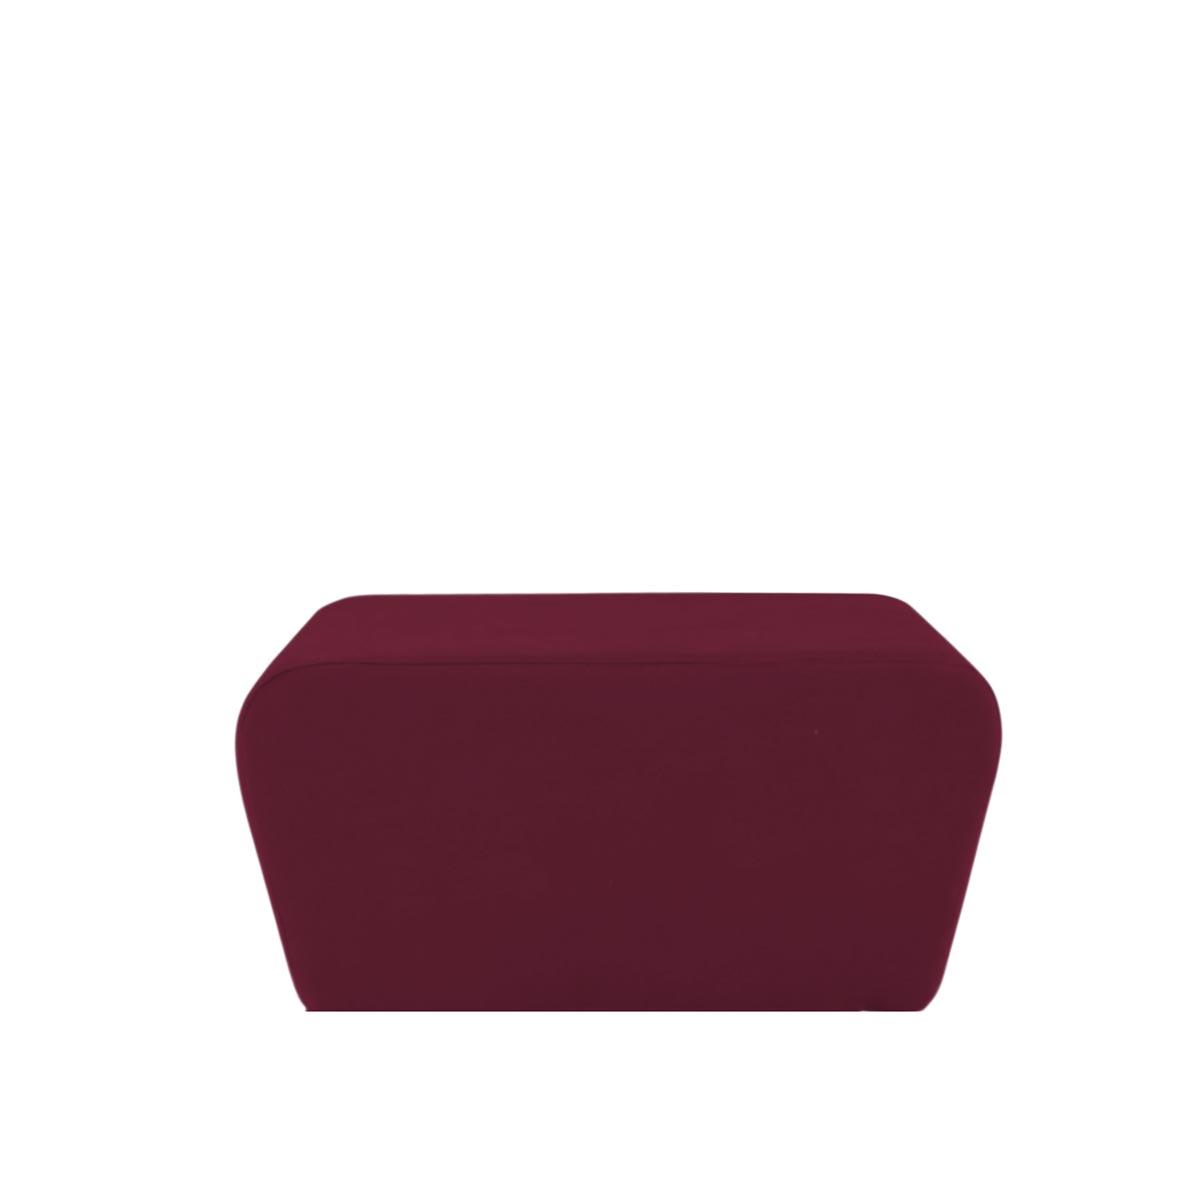 Pufe Muss R02 Tecido Lonita Vinho 03